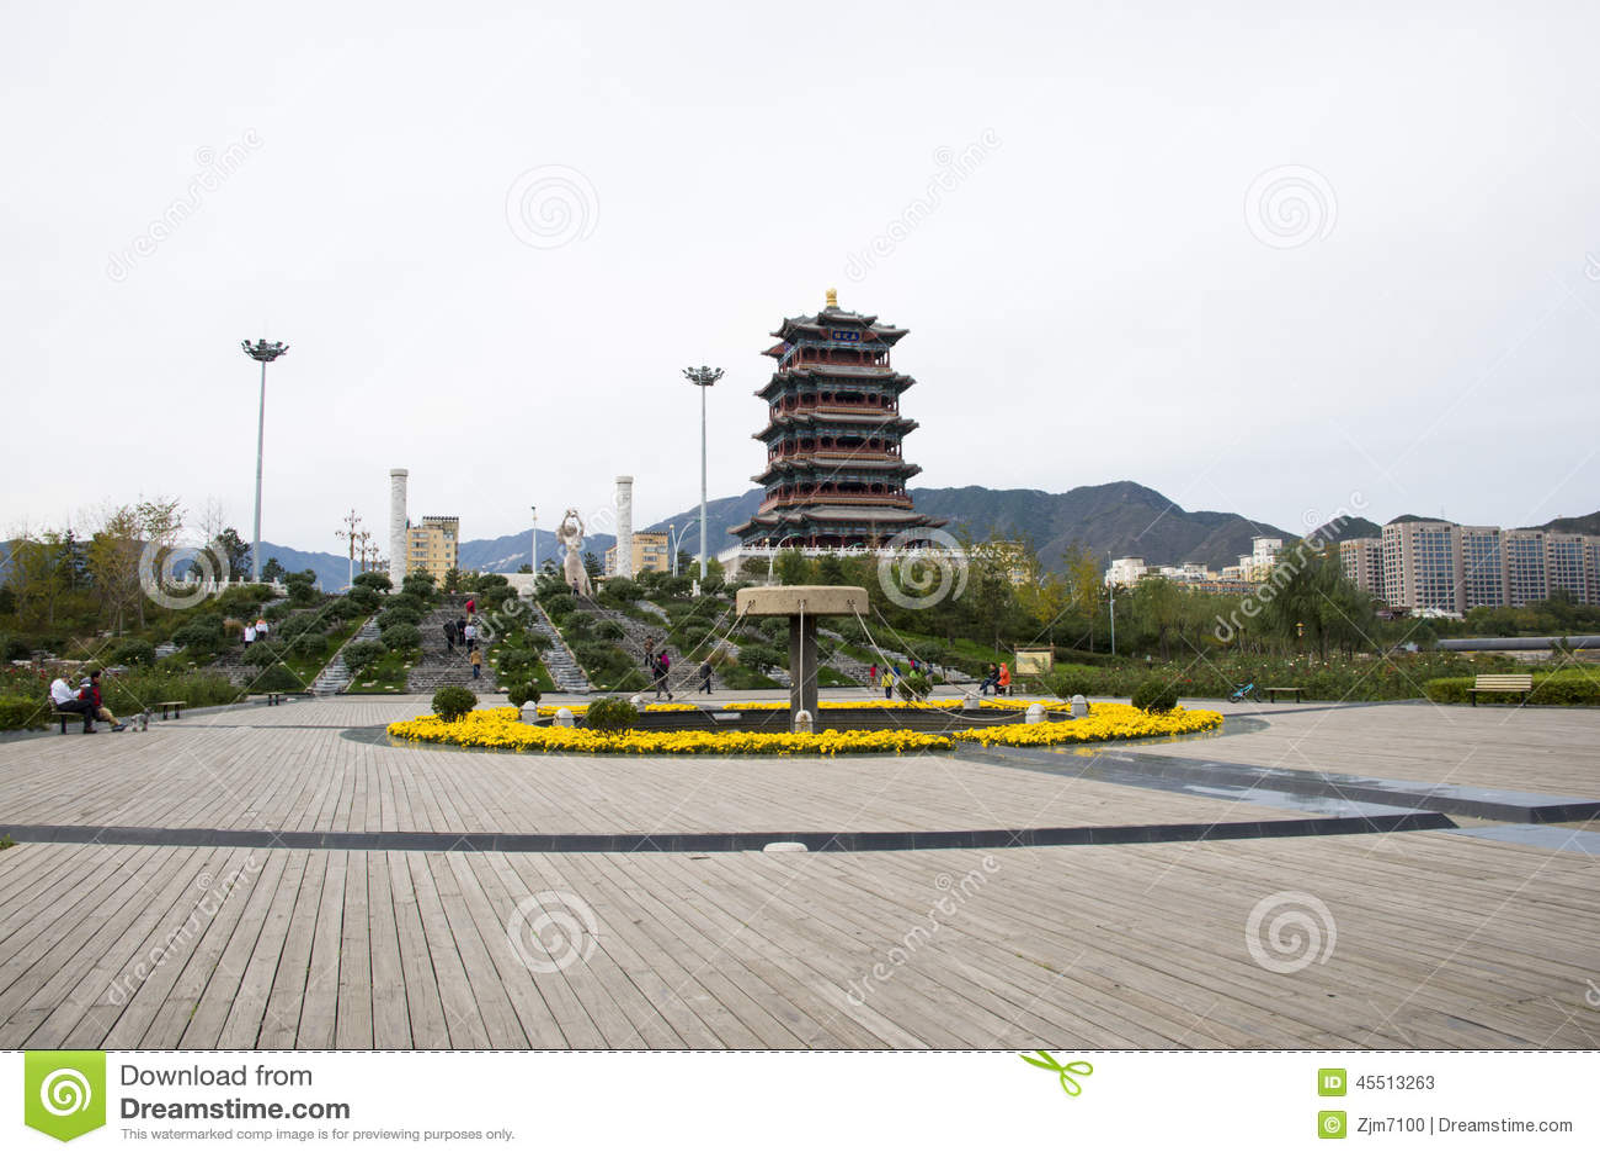 W Azja, Chiny, Pekin, Mentougou antykwarski budynek, Yong ding Lou